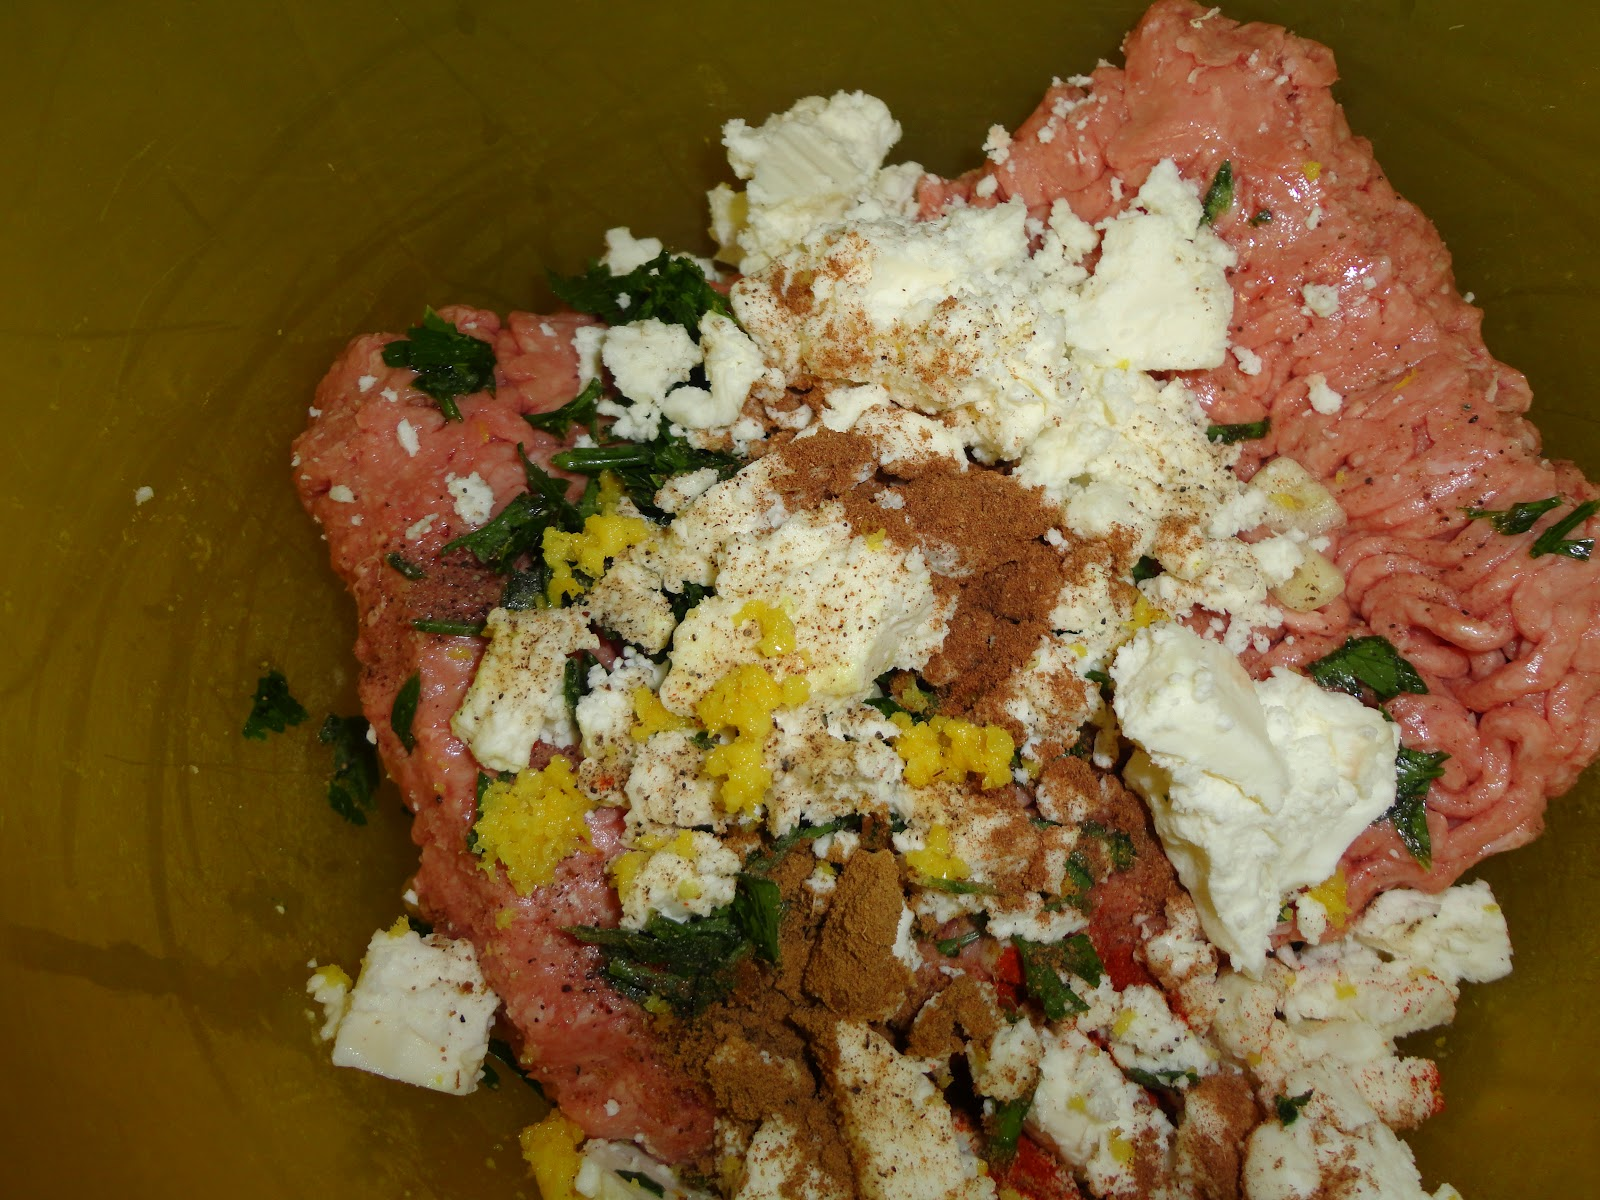 A Mothers Ramblings: Lamb & Feta Burgers with McCains Wedges (1/2 a